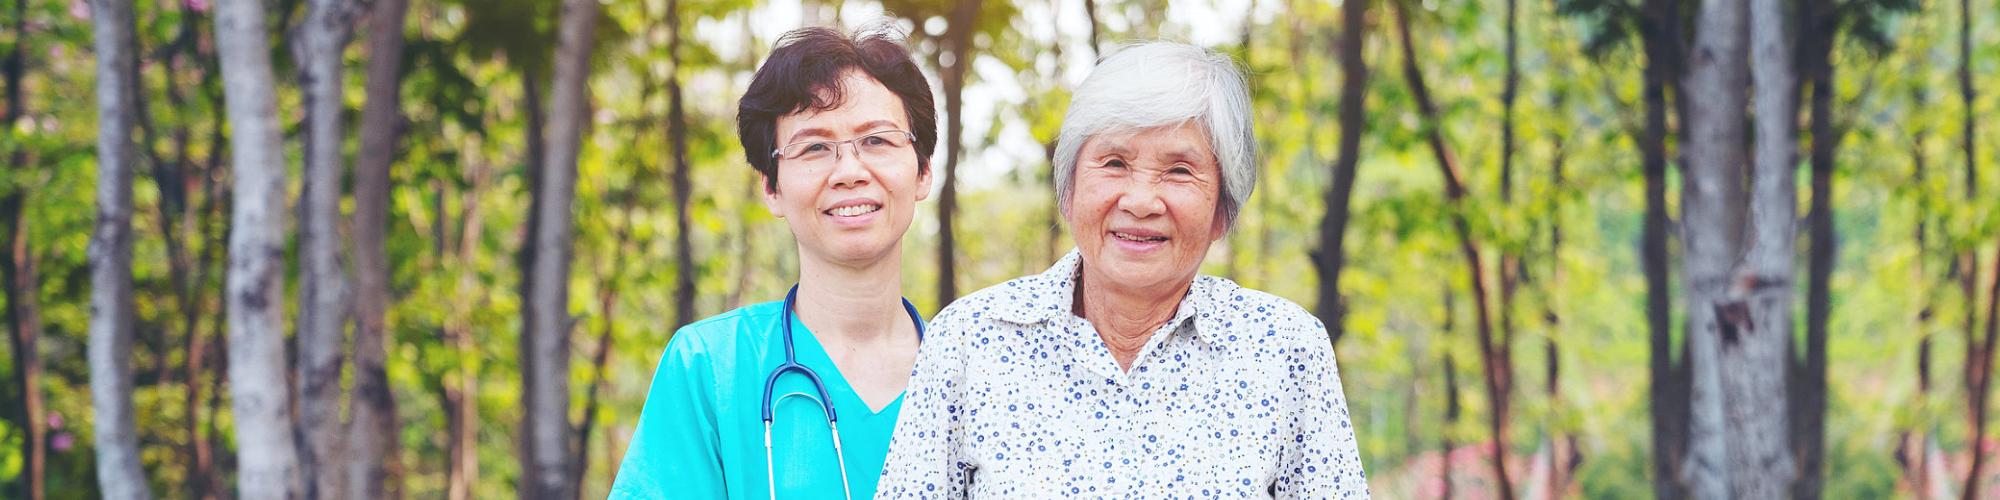 nurse with senior smiling